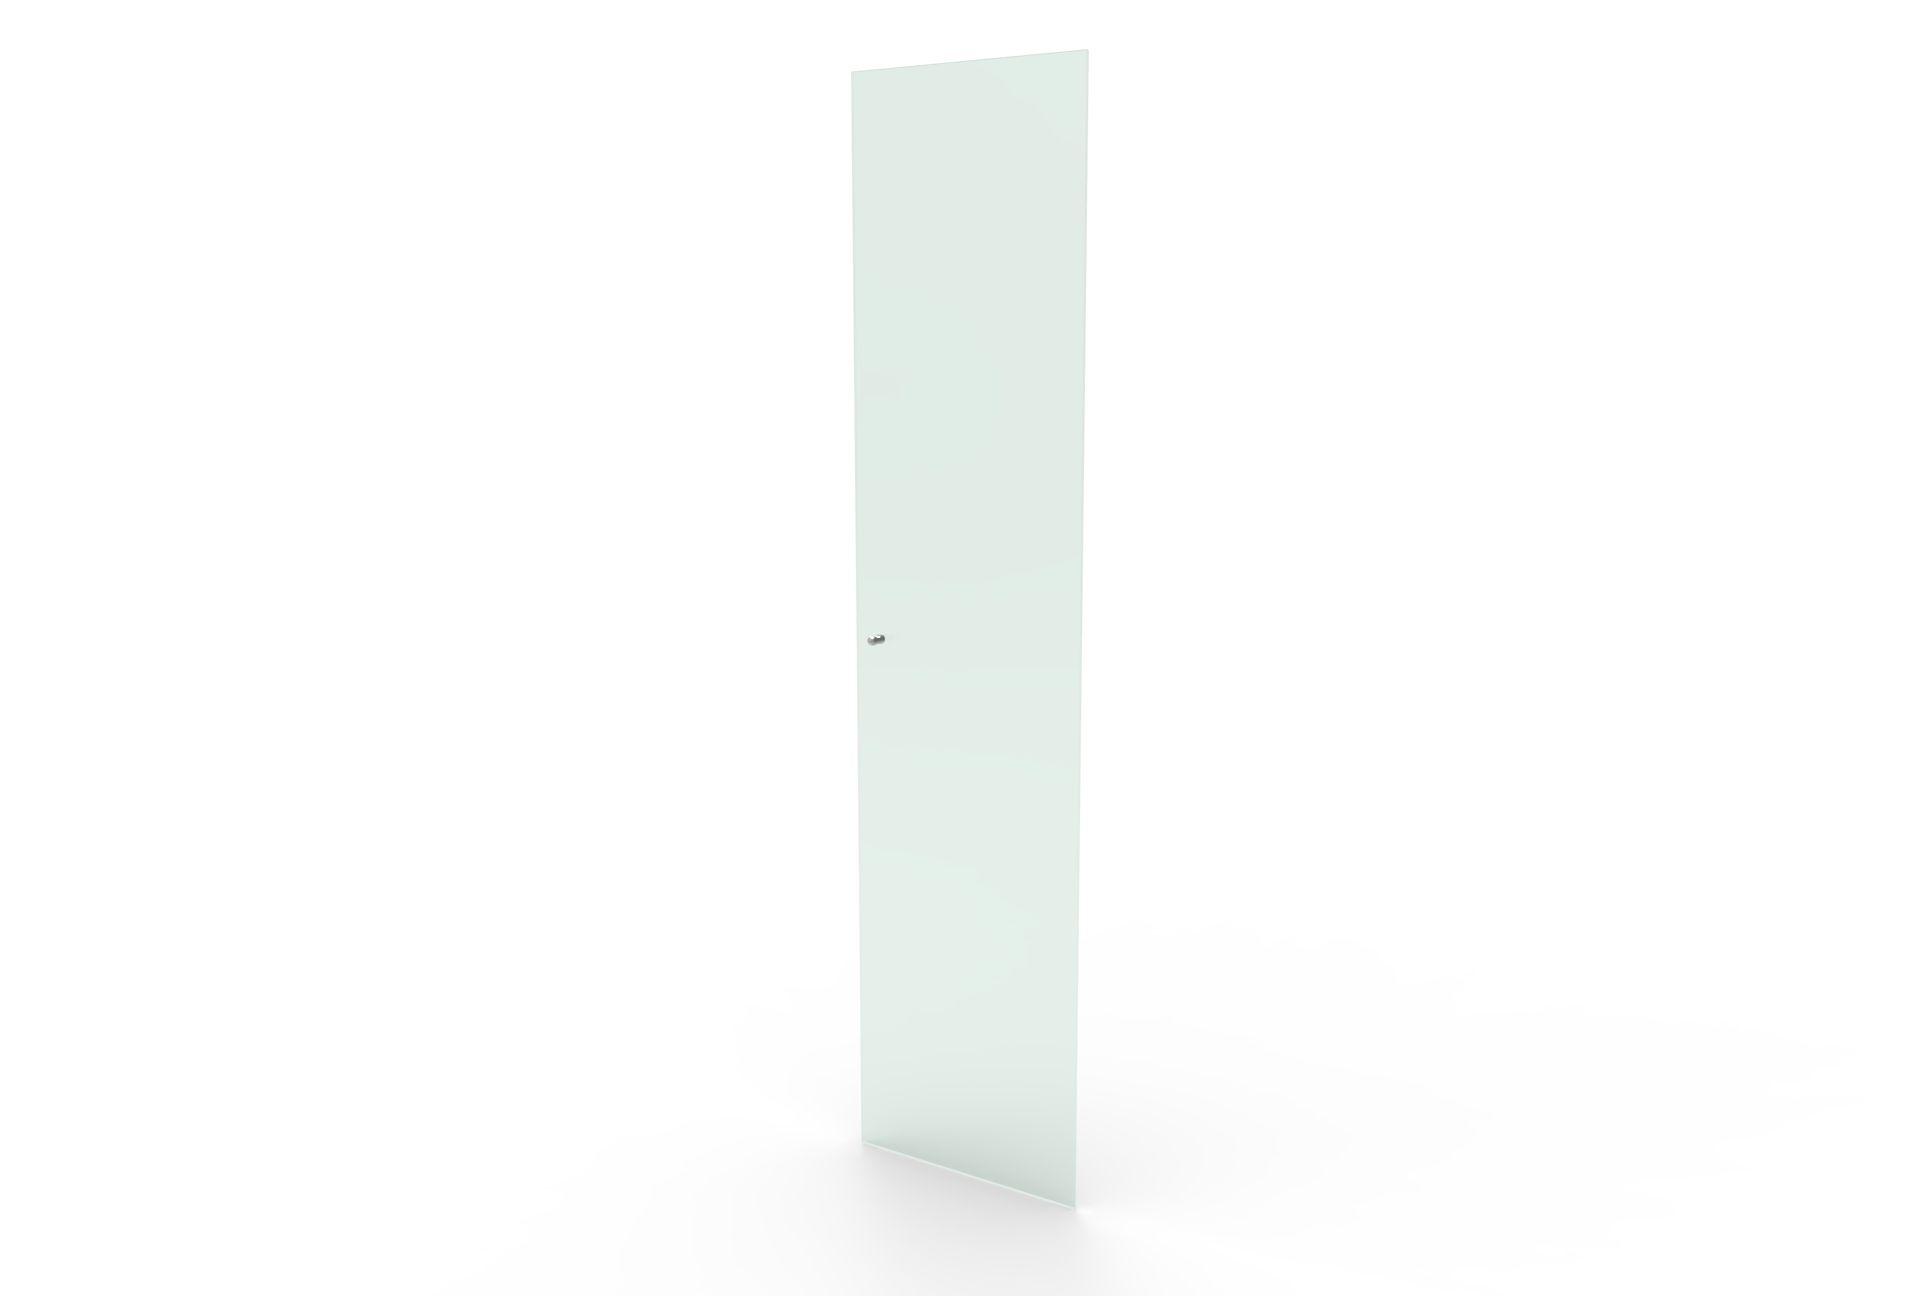 Estante VINIL/LIVROS/MULTI 450 Vinis Tabaco com porta de vidro incolor sem chave